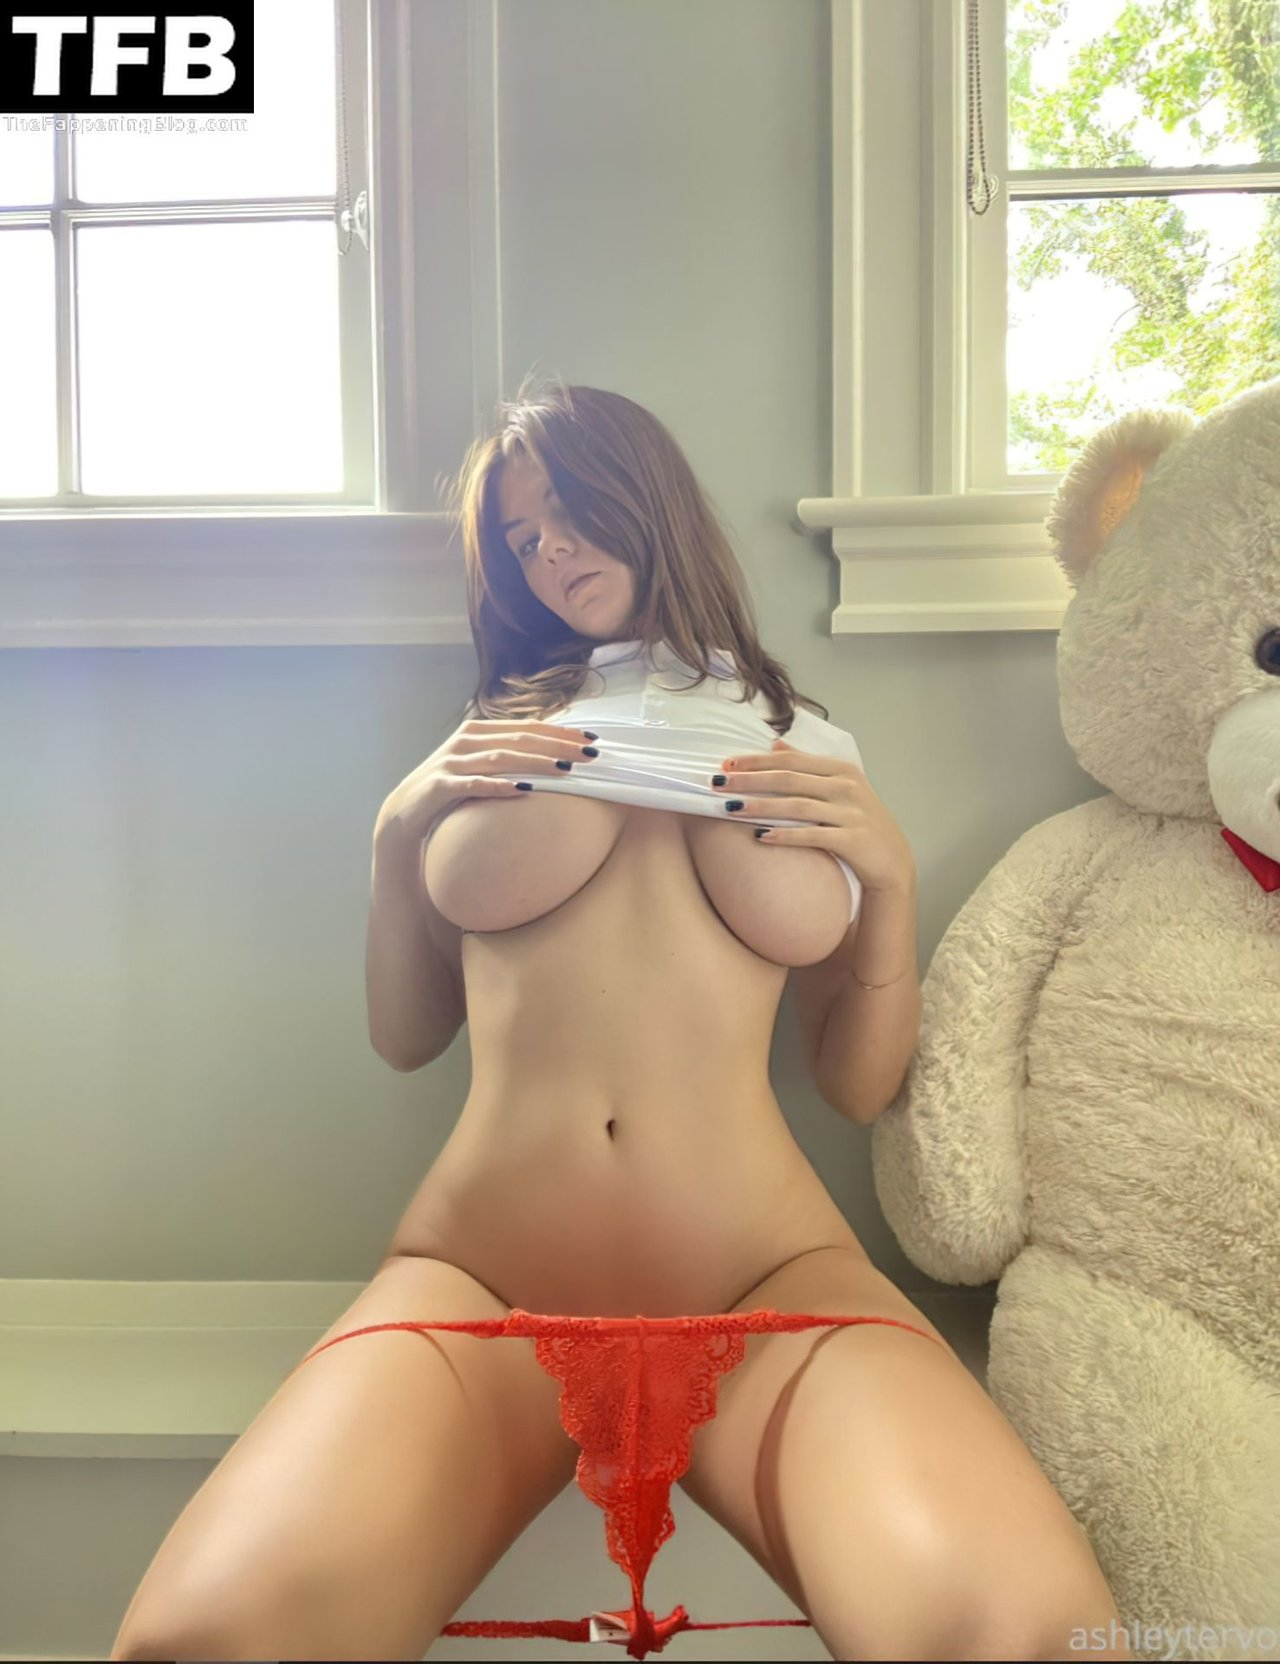 Ashley Tervort Topless Tits 1